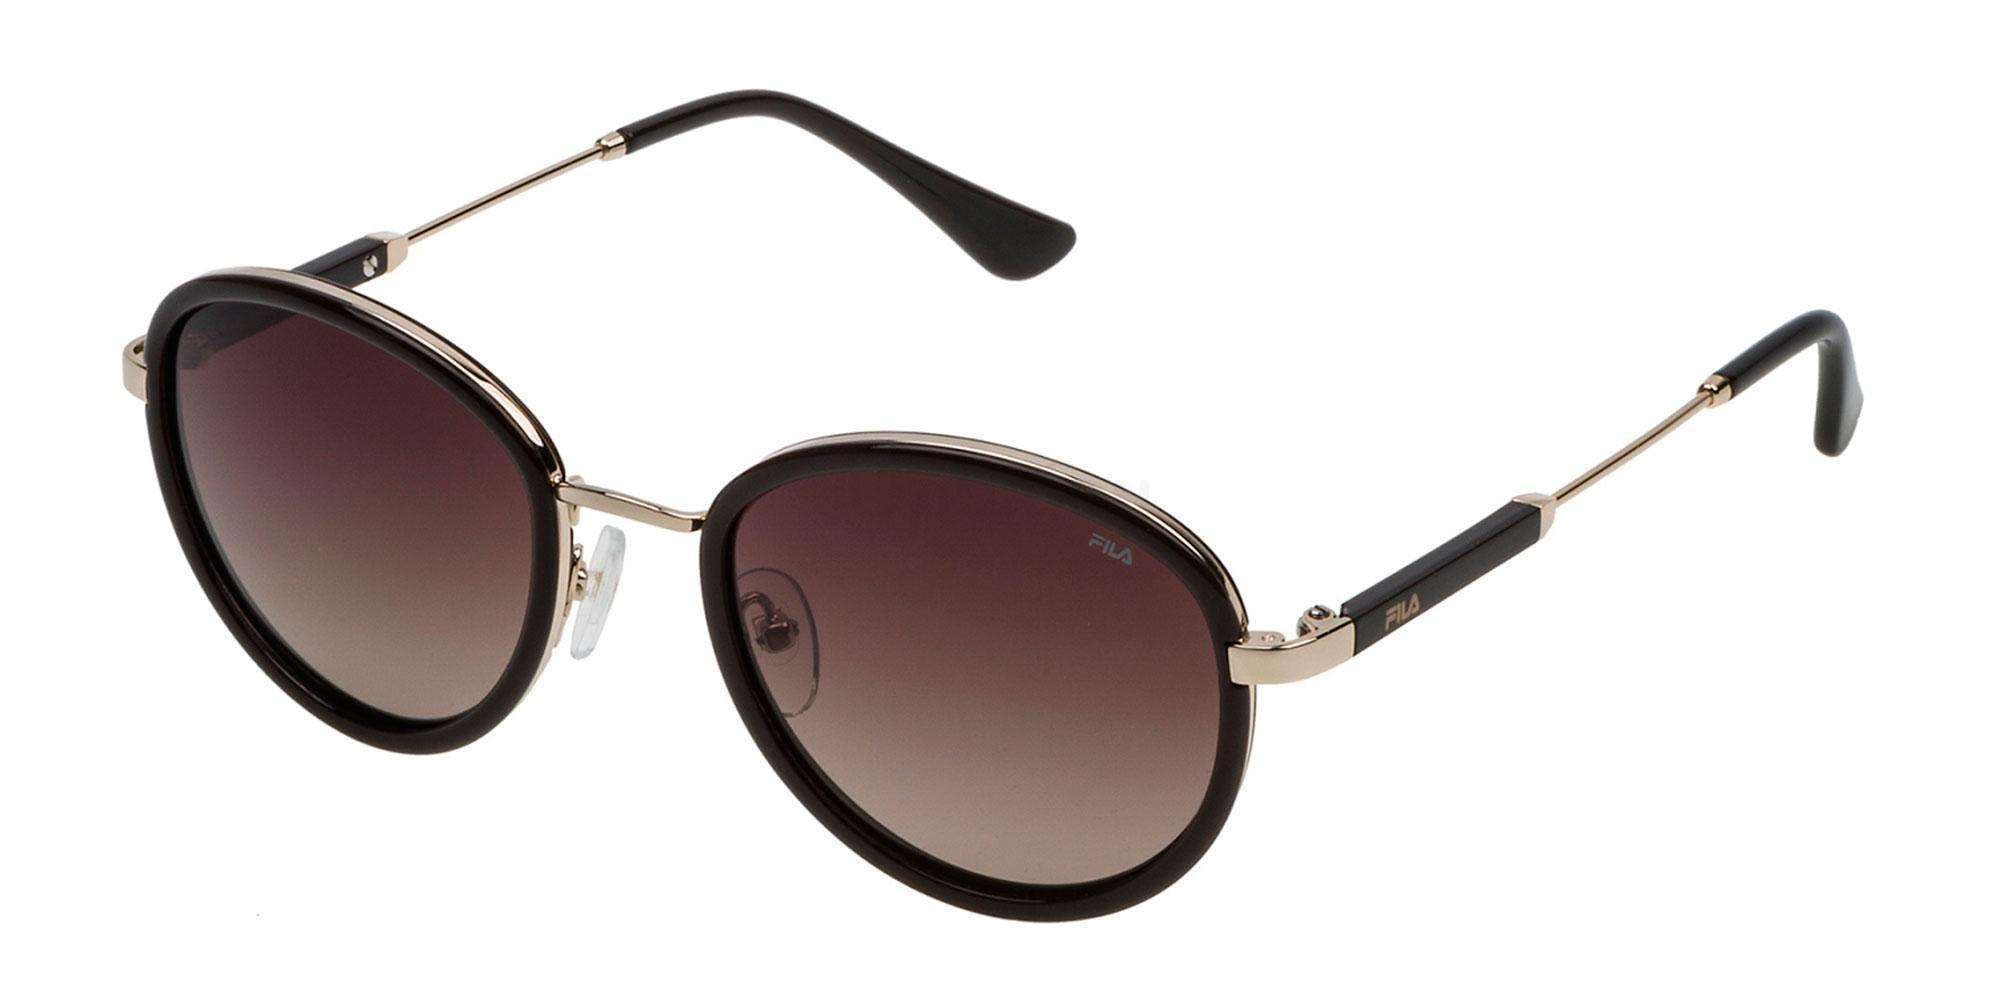 300P SF9758 Sunglasses, Fila